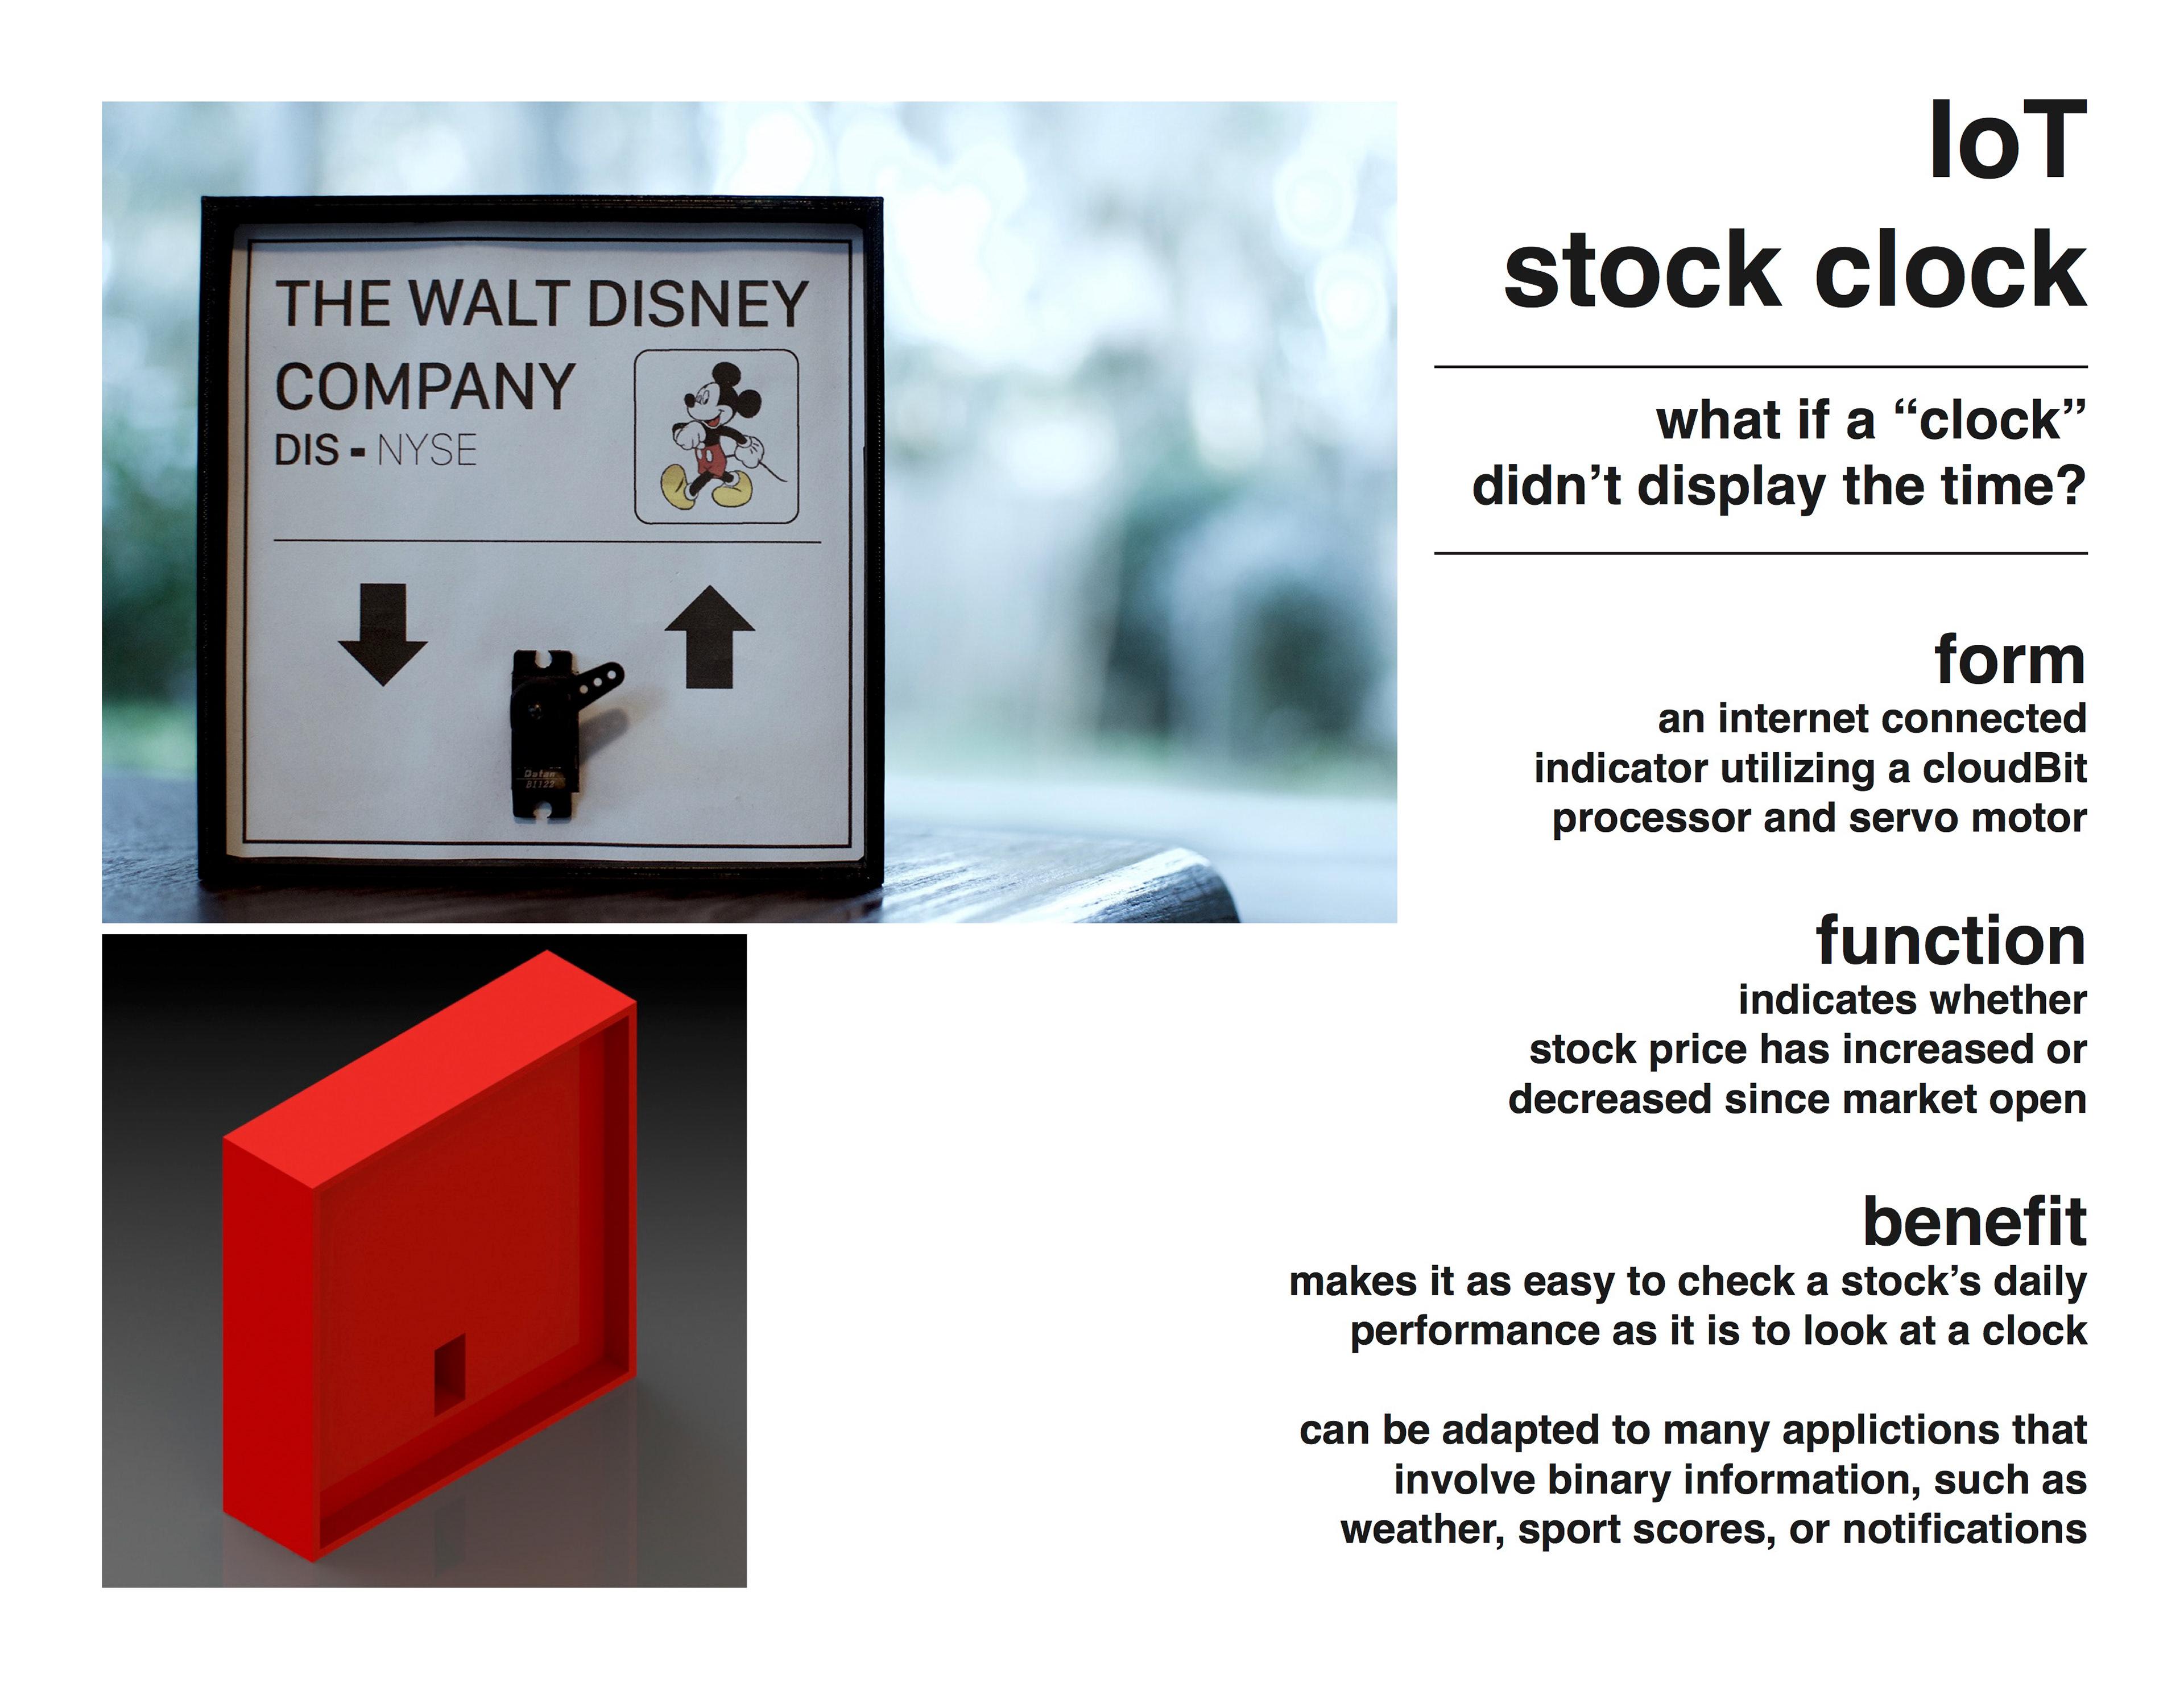 John kiernan lewis iot stock clock iot stock clock biocorpaavc Choice Image